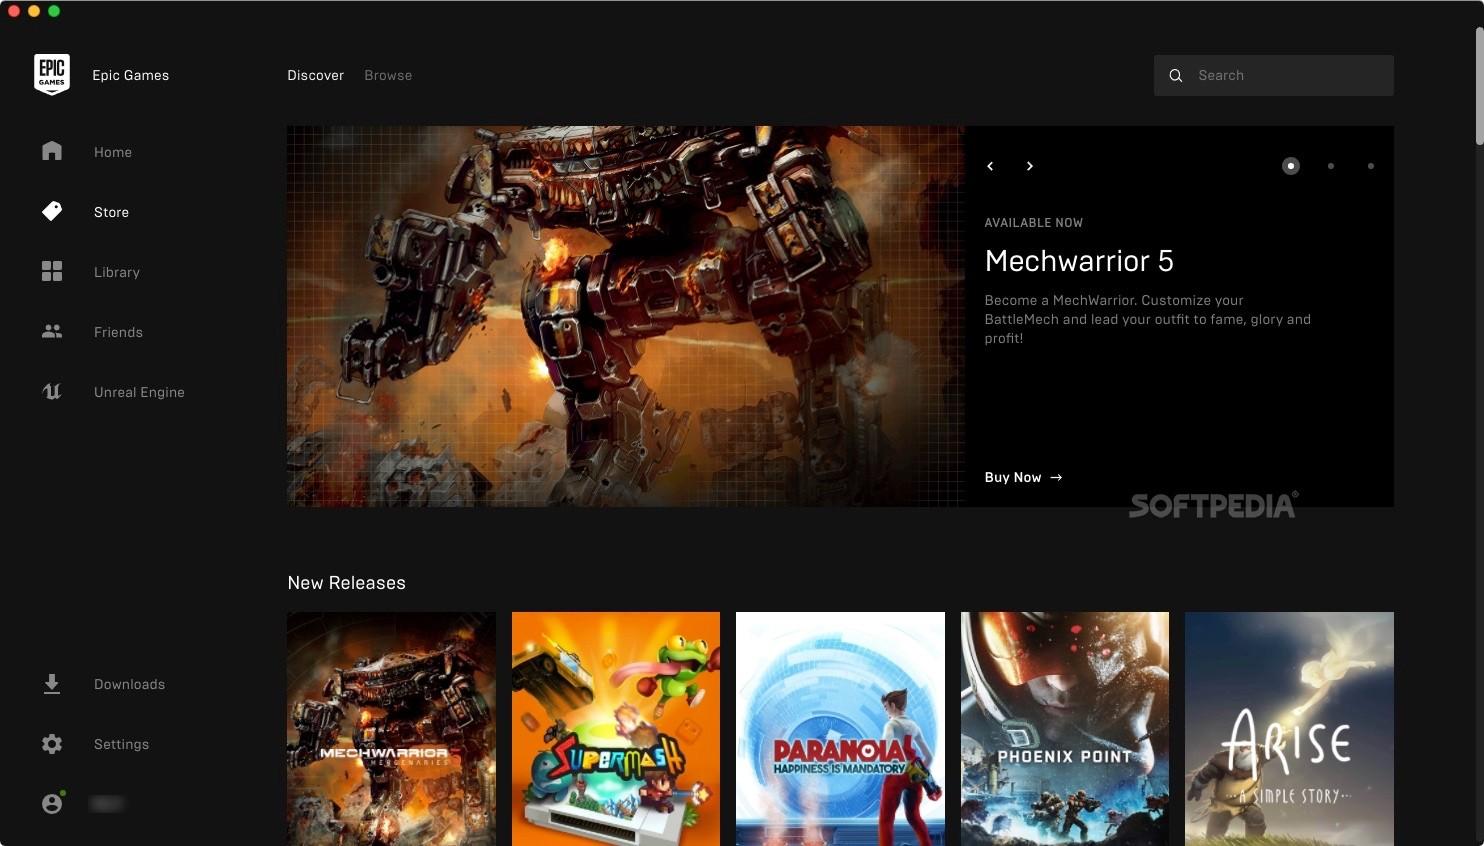 Epic Games Launcher Mac 10.18.8 - Download